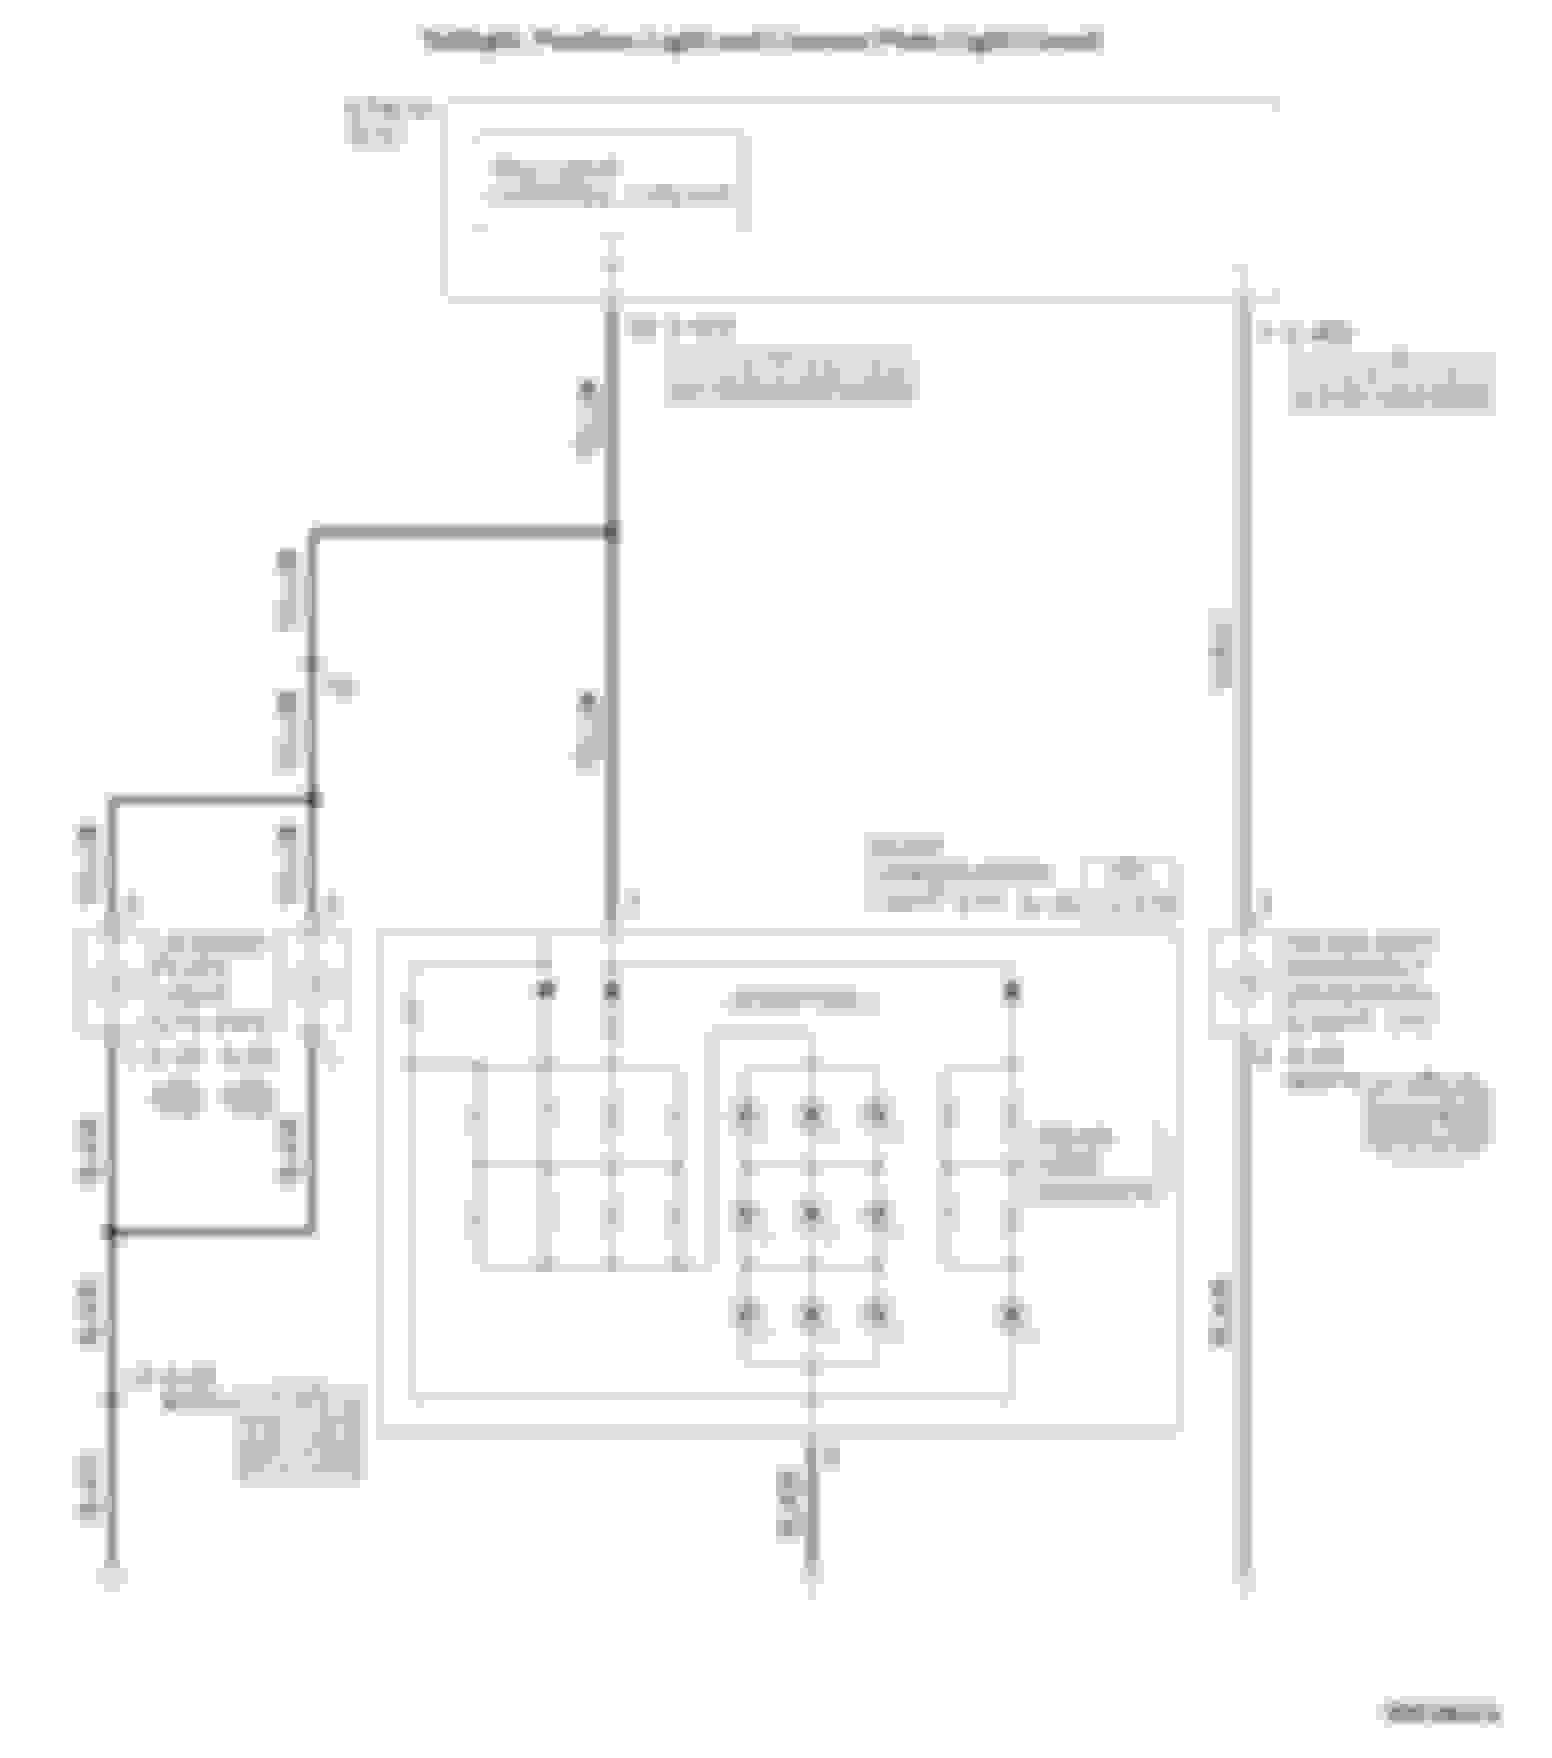 Mitsubishi Asx Wiring Diagram